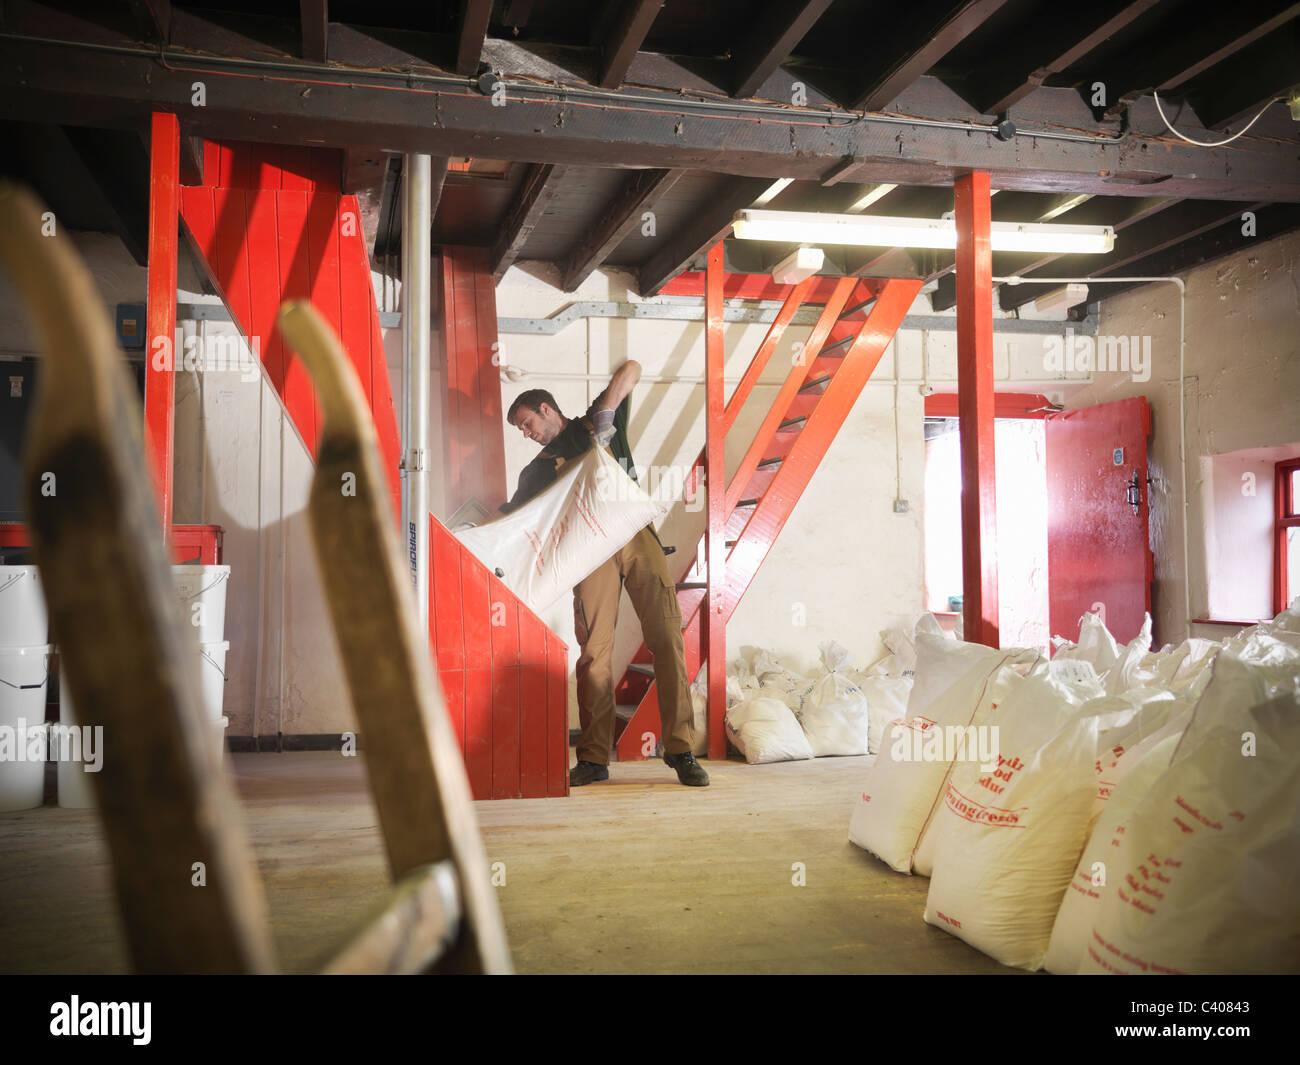 Worker emptying sack of grain in brewery - Stock Image